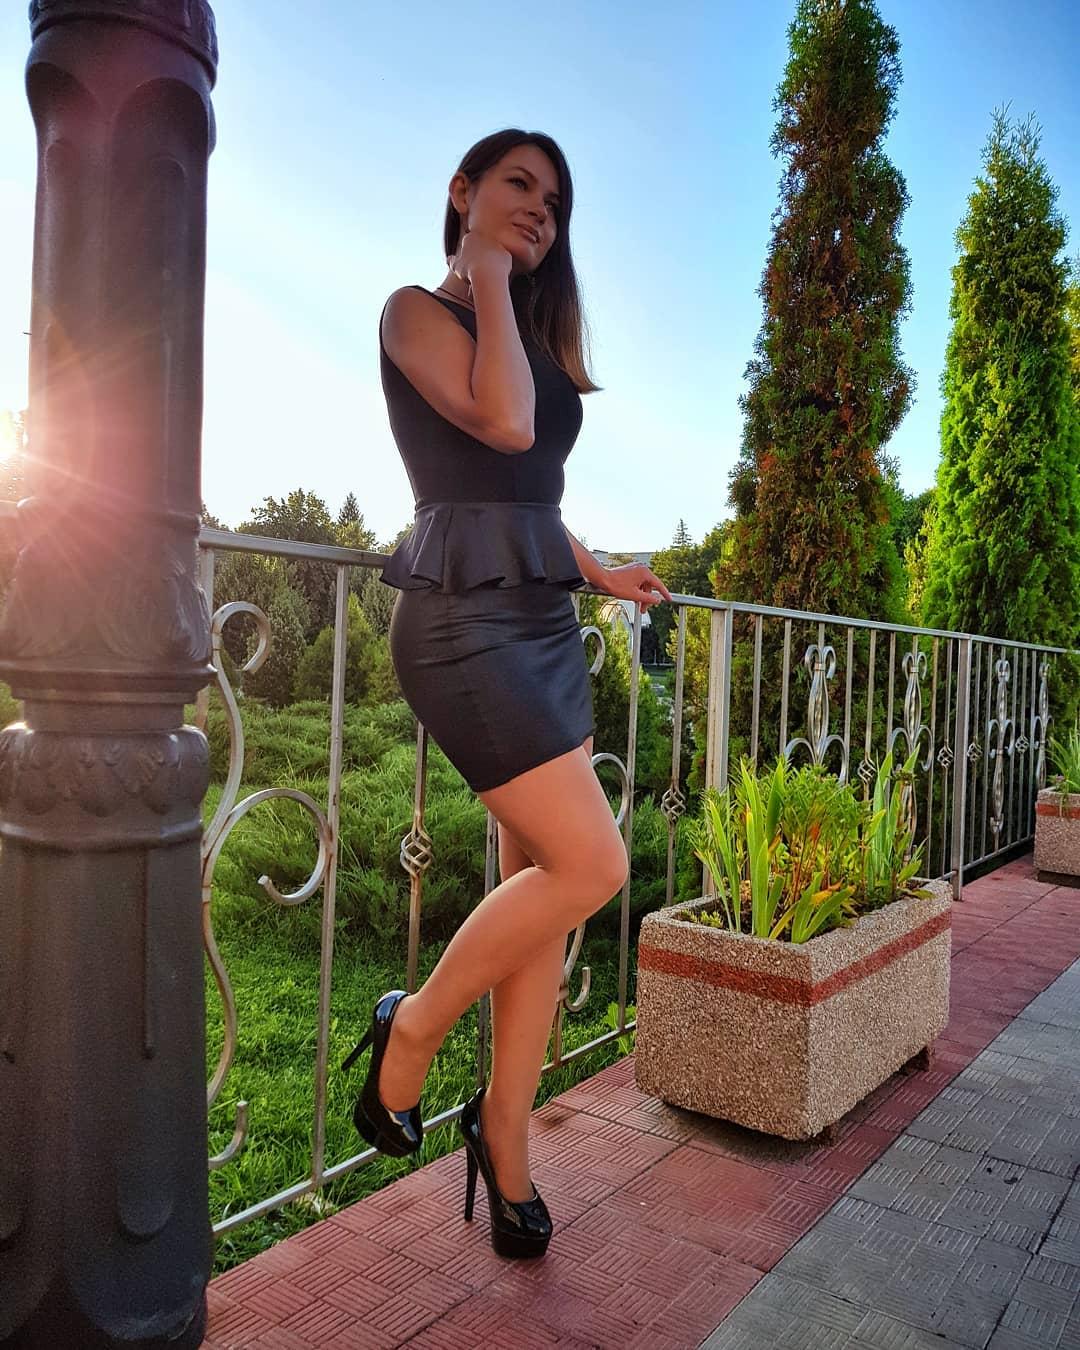 Olga-Madych-Wallpapers-Insta-Fit-Bio-19